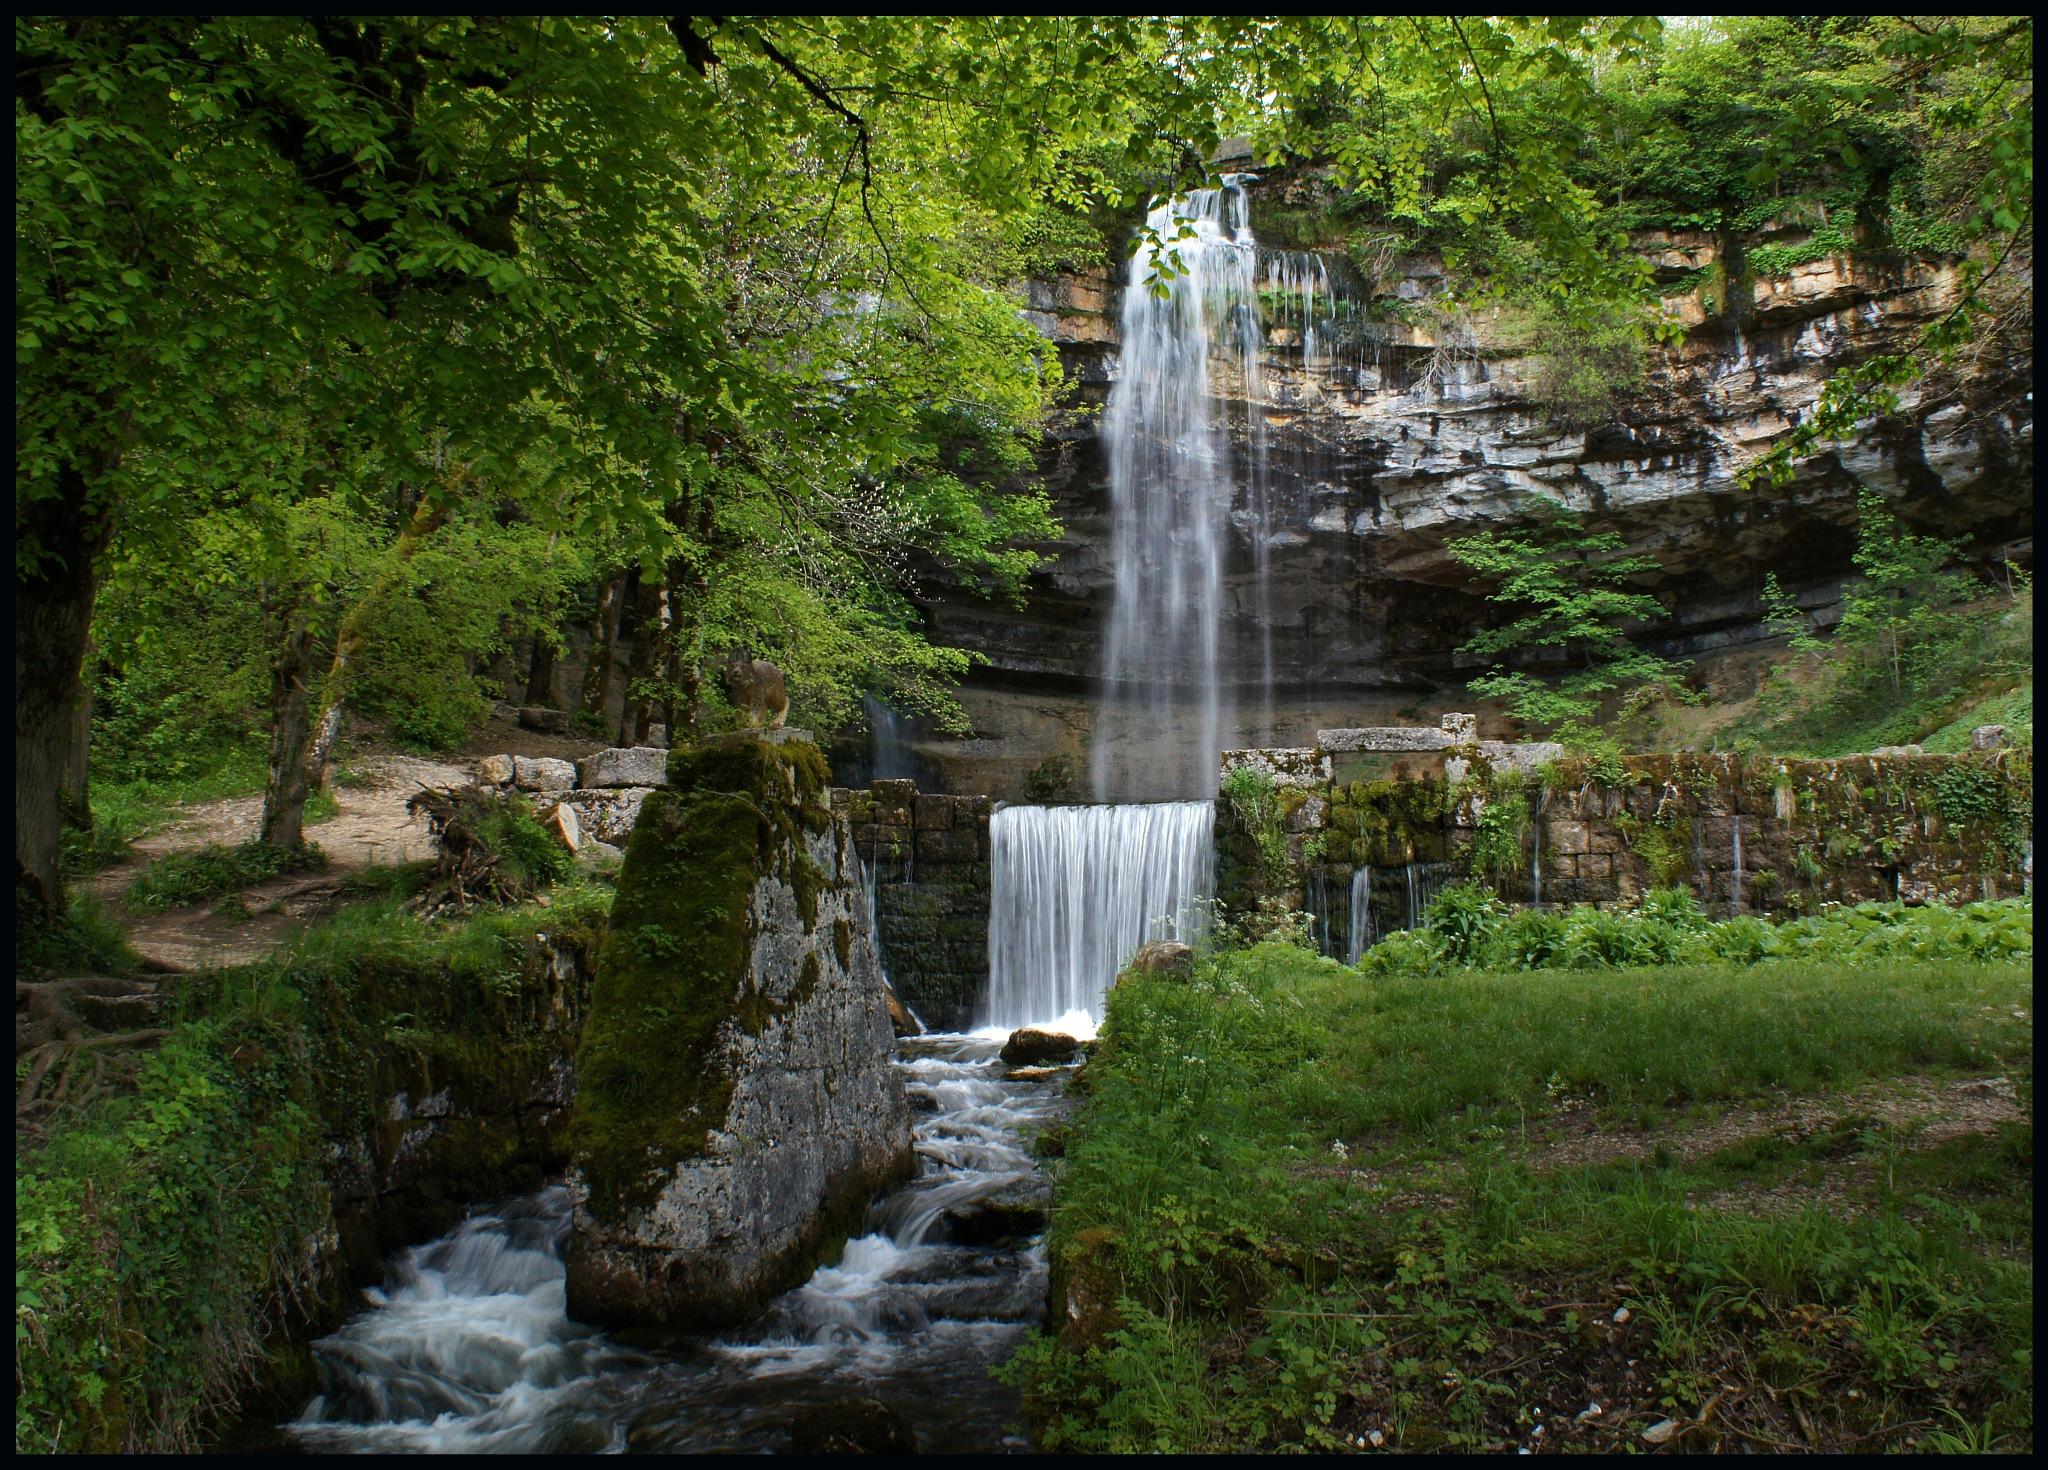 Saut Girard Falls by Marilyn Bielski